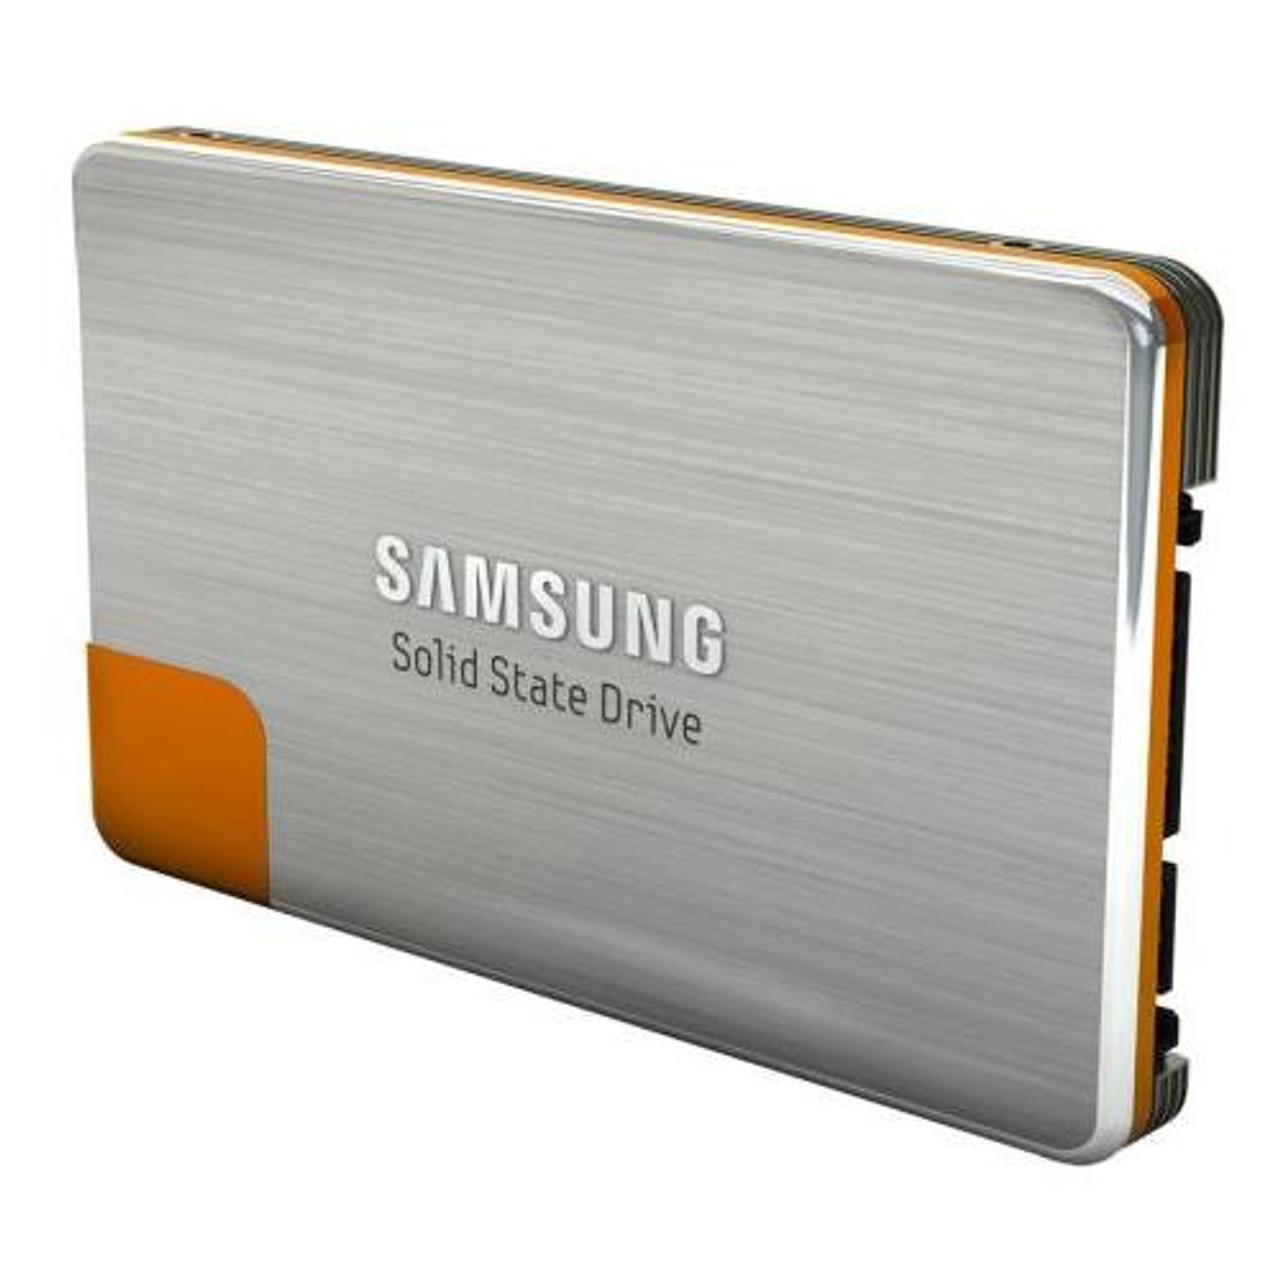 Samsung 16GB Solid State Drive 2.5 Sata SSD Hard Drive